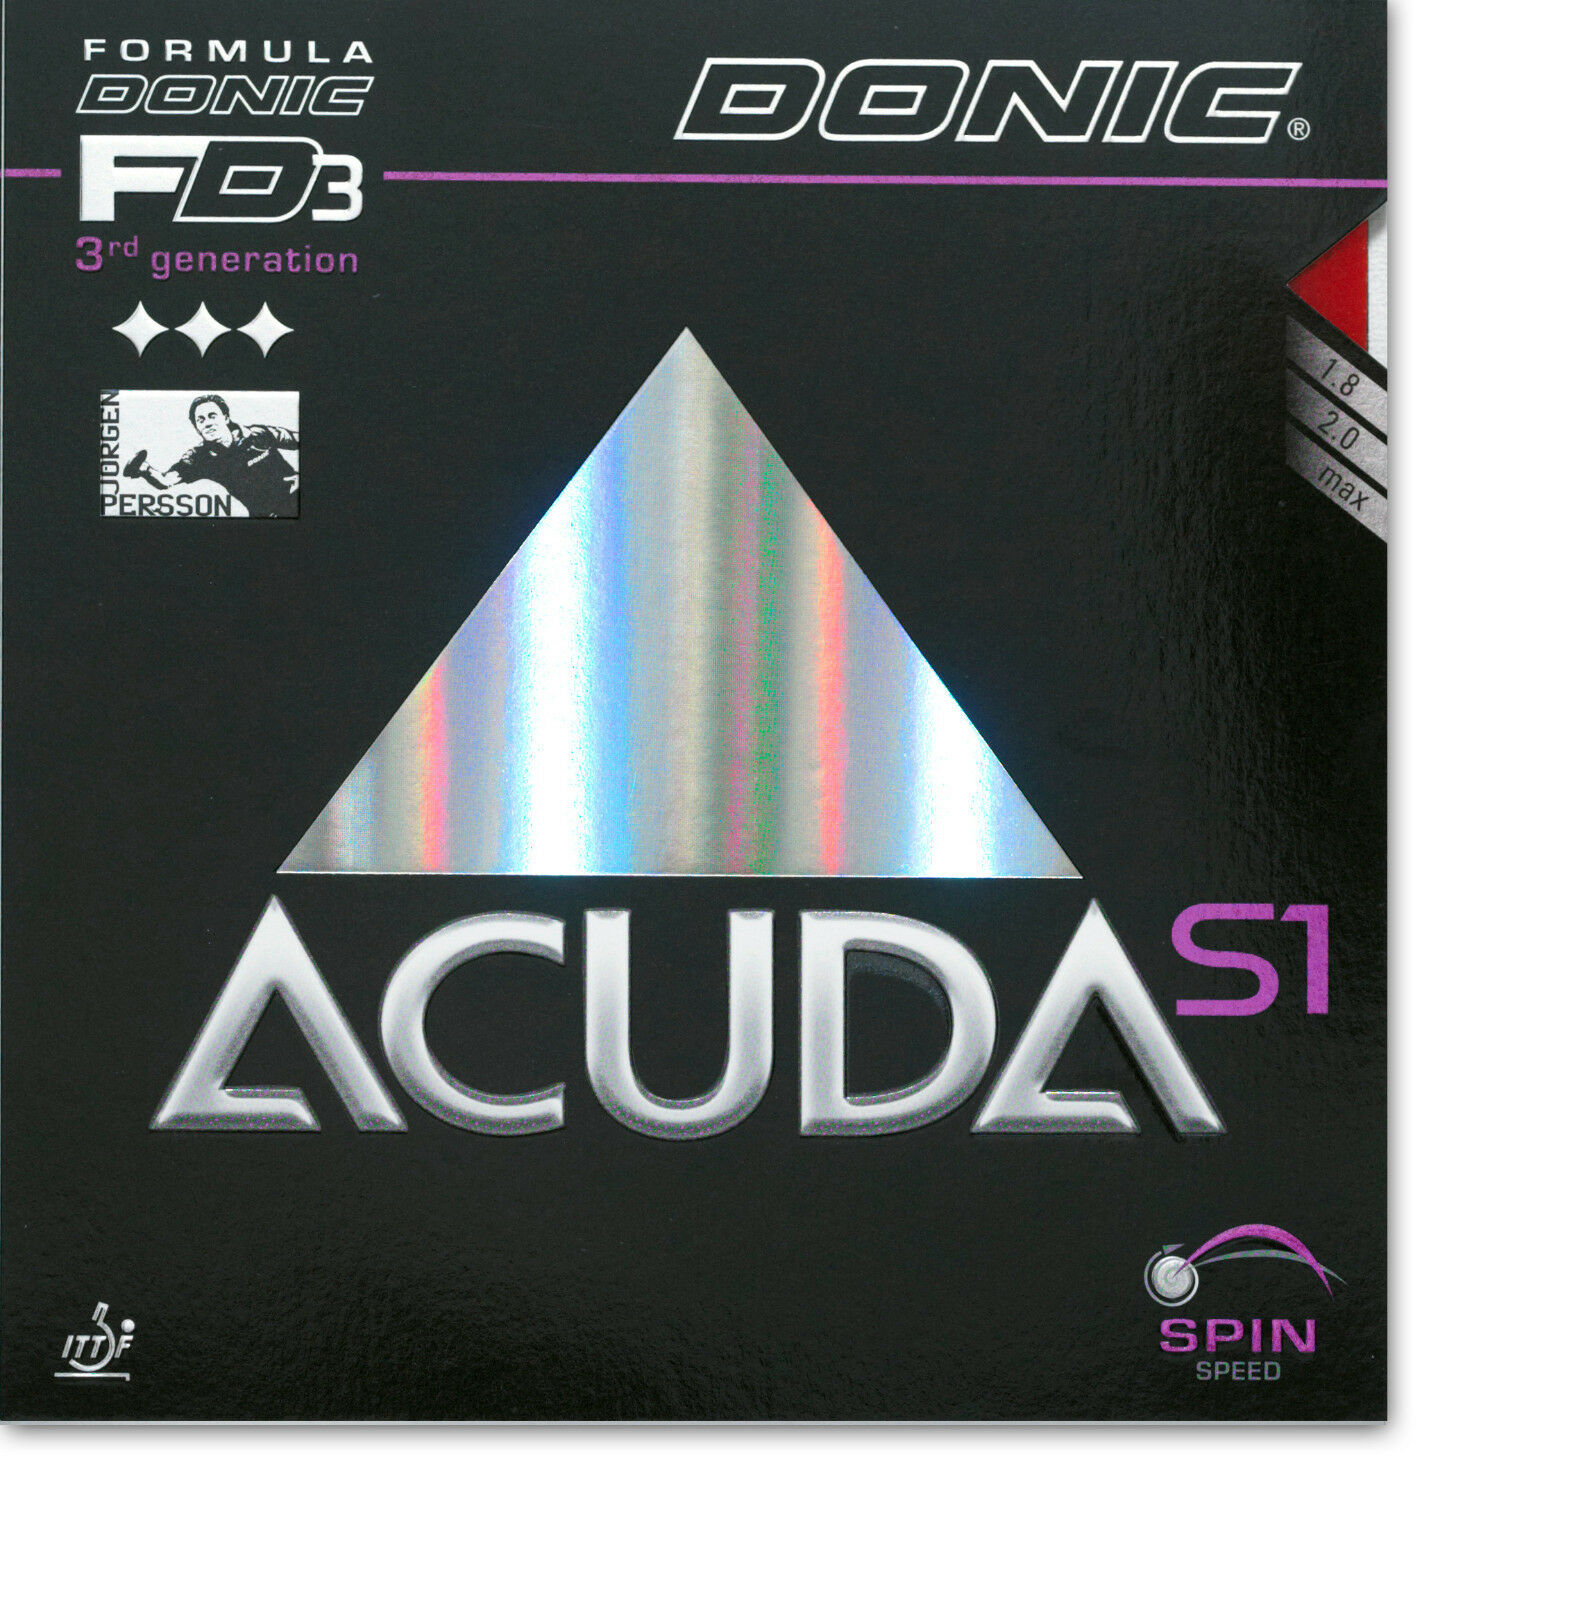 DONIC Acuda S1 2,0mm 2,0mm 2,0mm schwarz  NEU   OVP 69ffc0